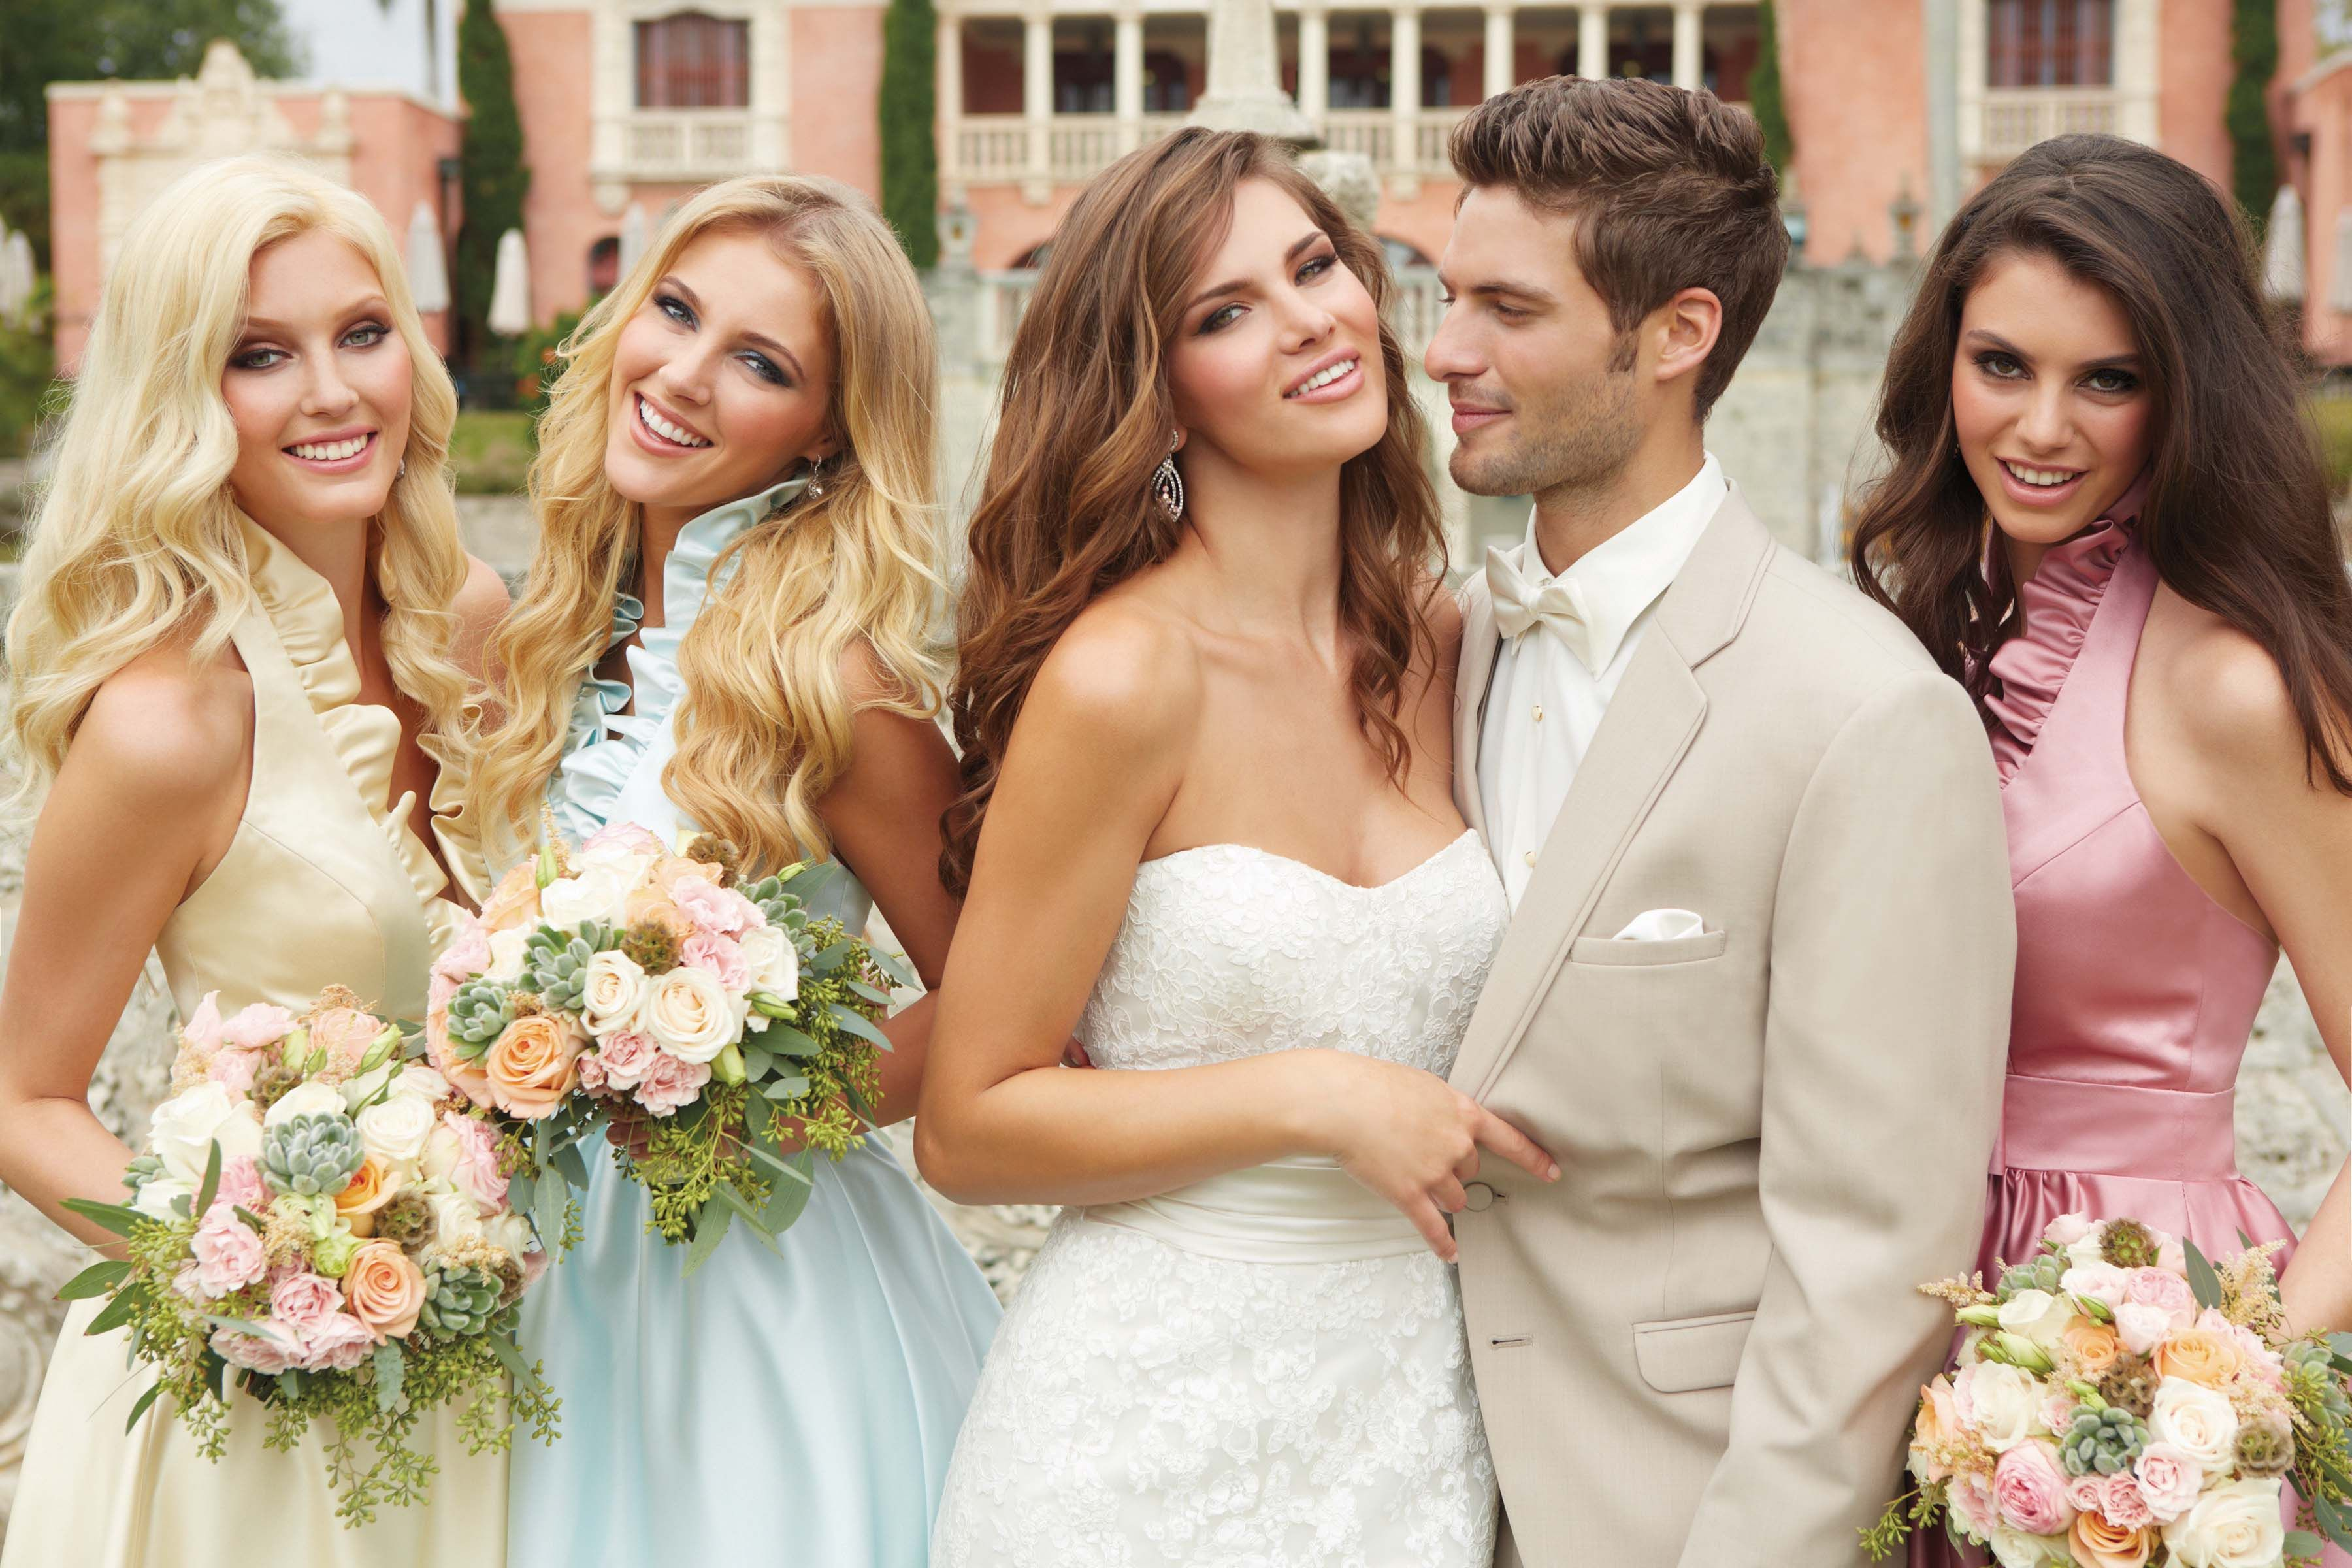 Tan tux different colored bridesmaid dresses mens sarno tuxedos tan tux different colored bridesmaid dresses ombrellifo Gallery